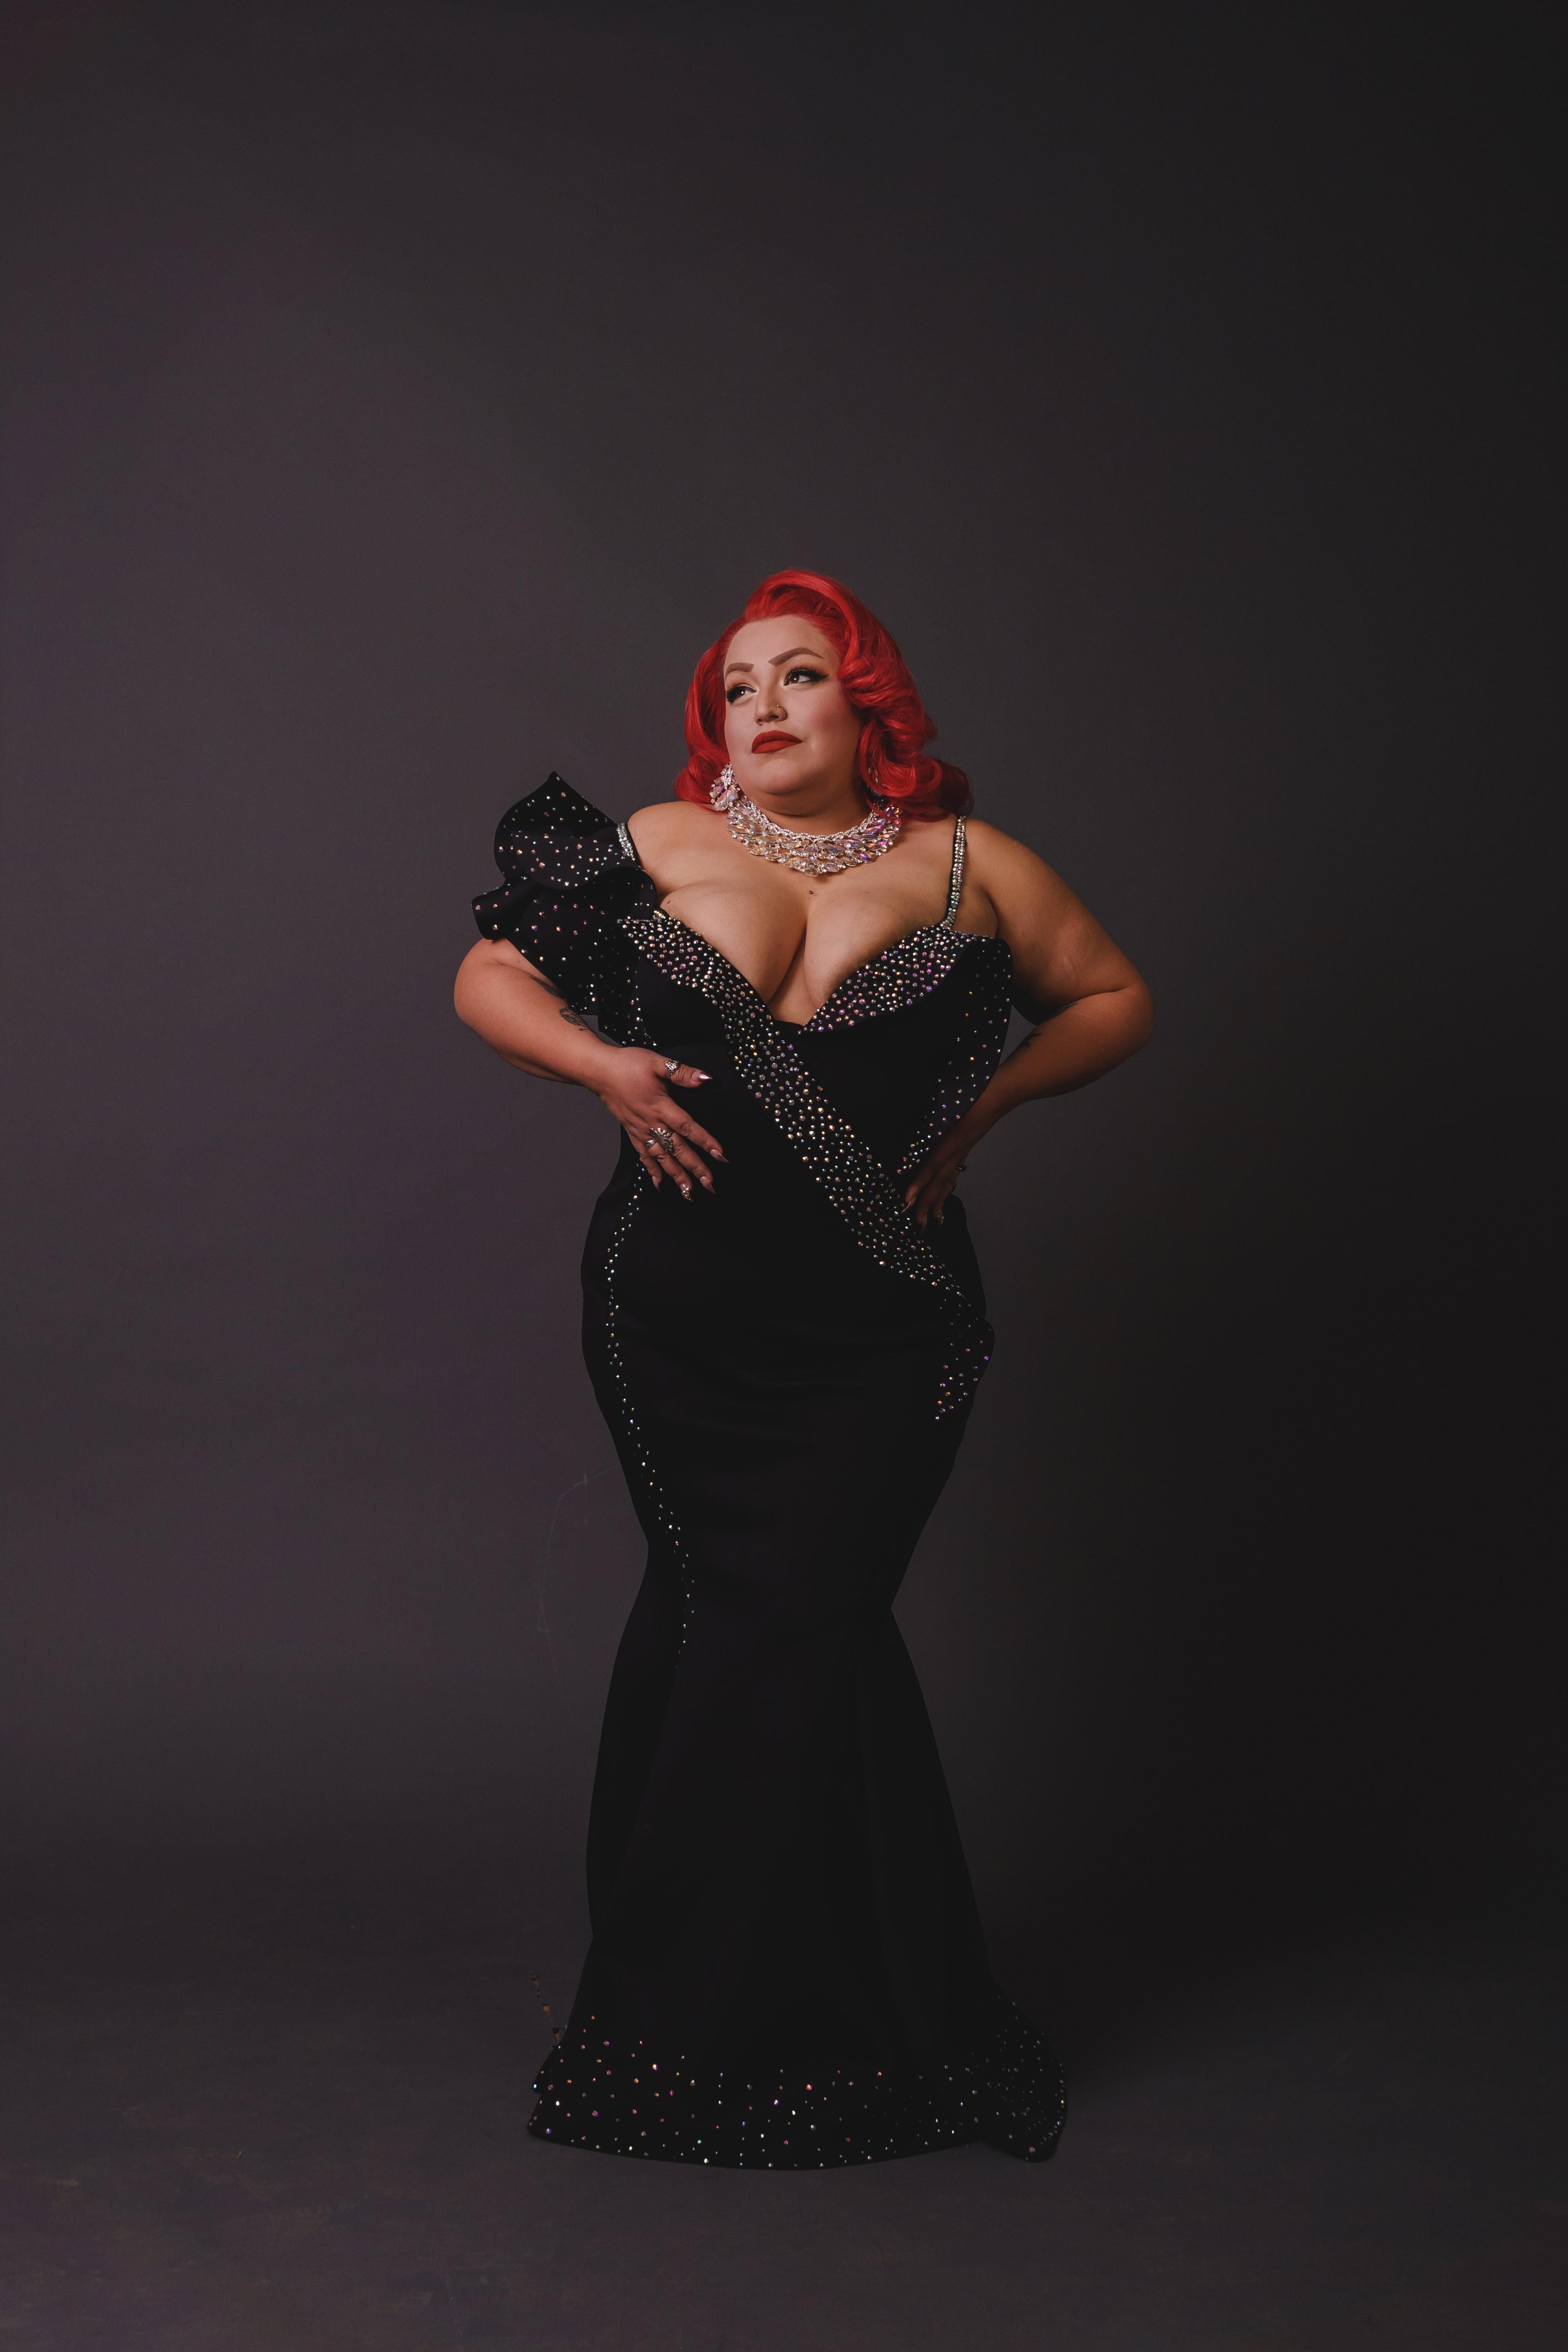 Bourlesque